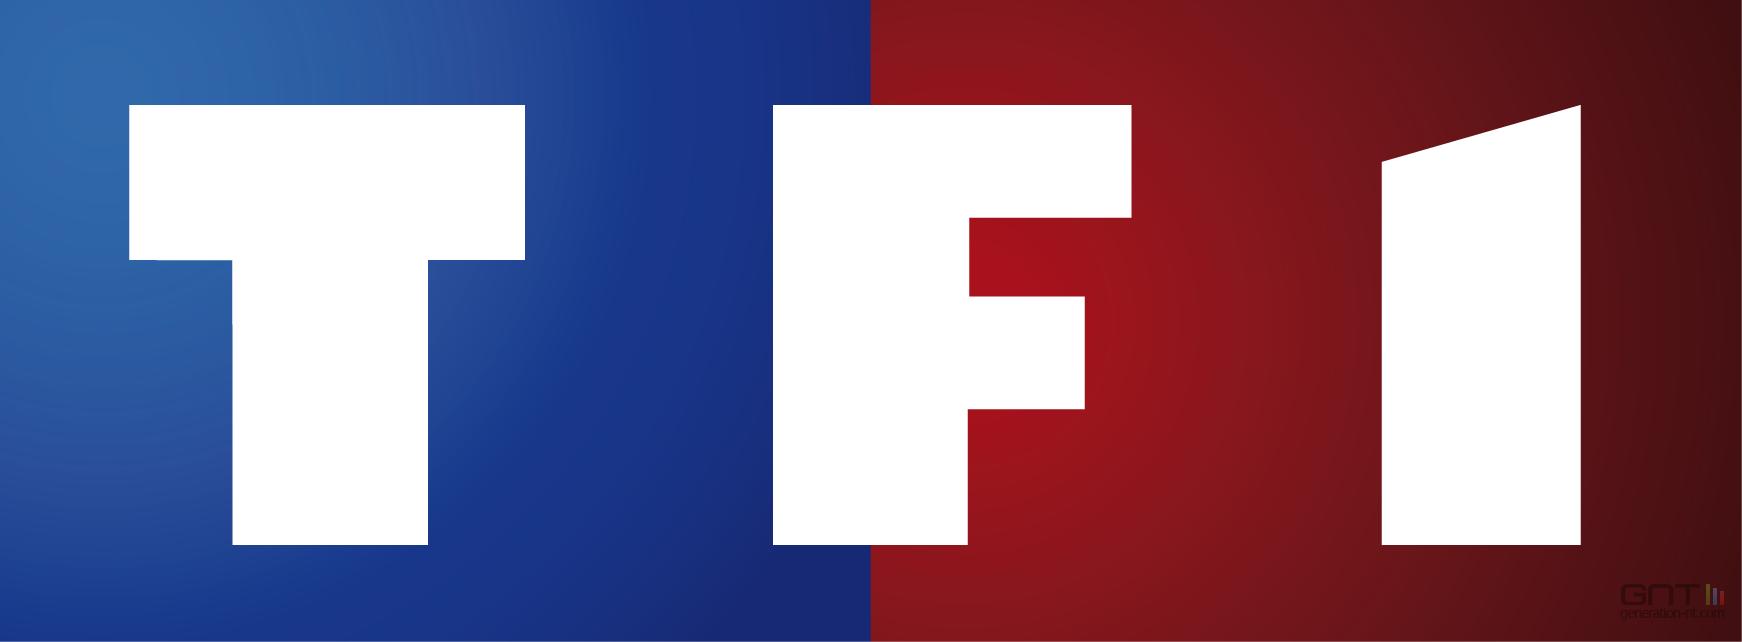 tf1-logo_0906CE028201568232